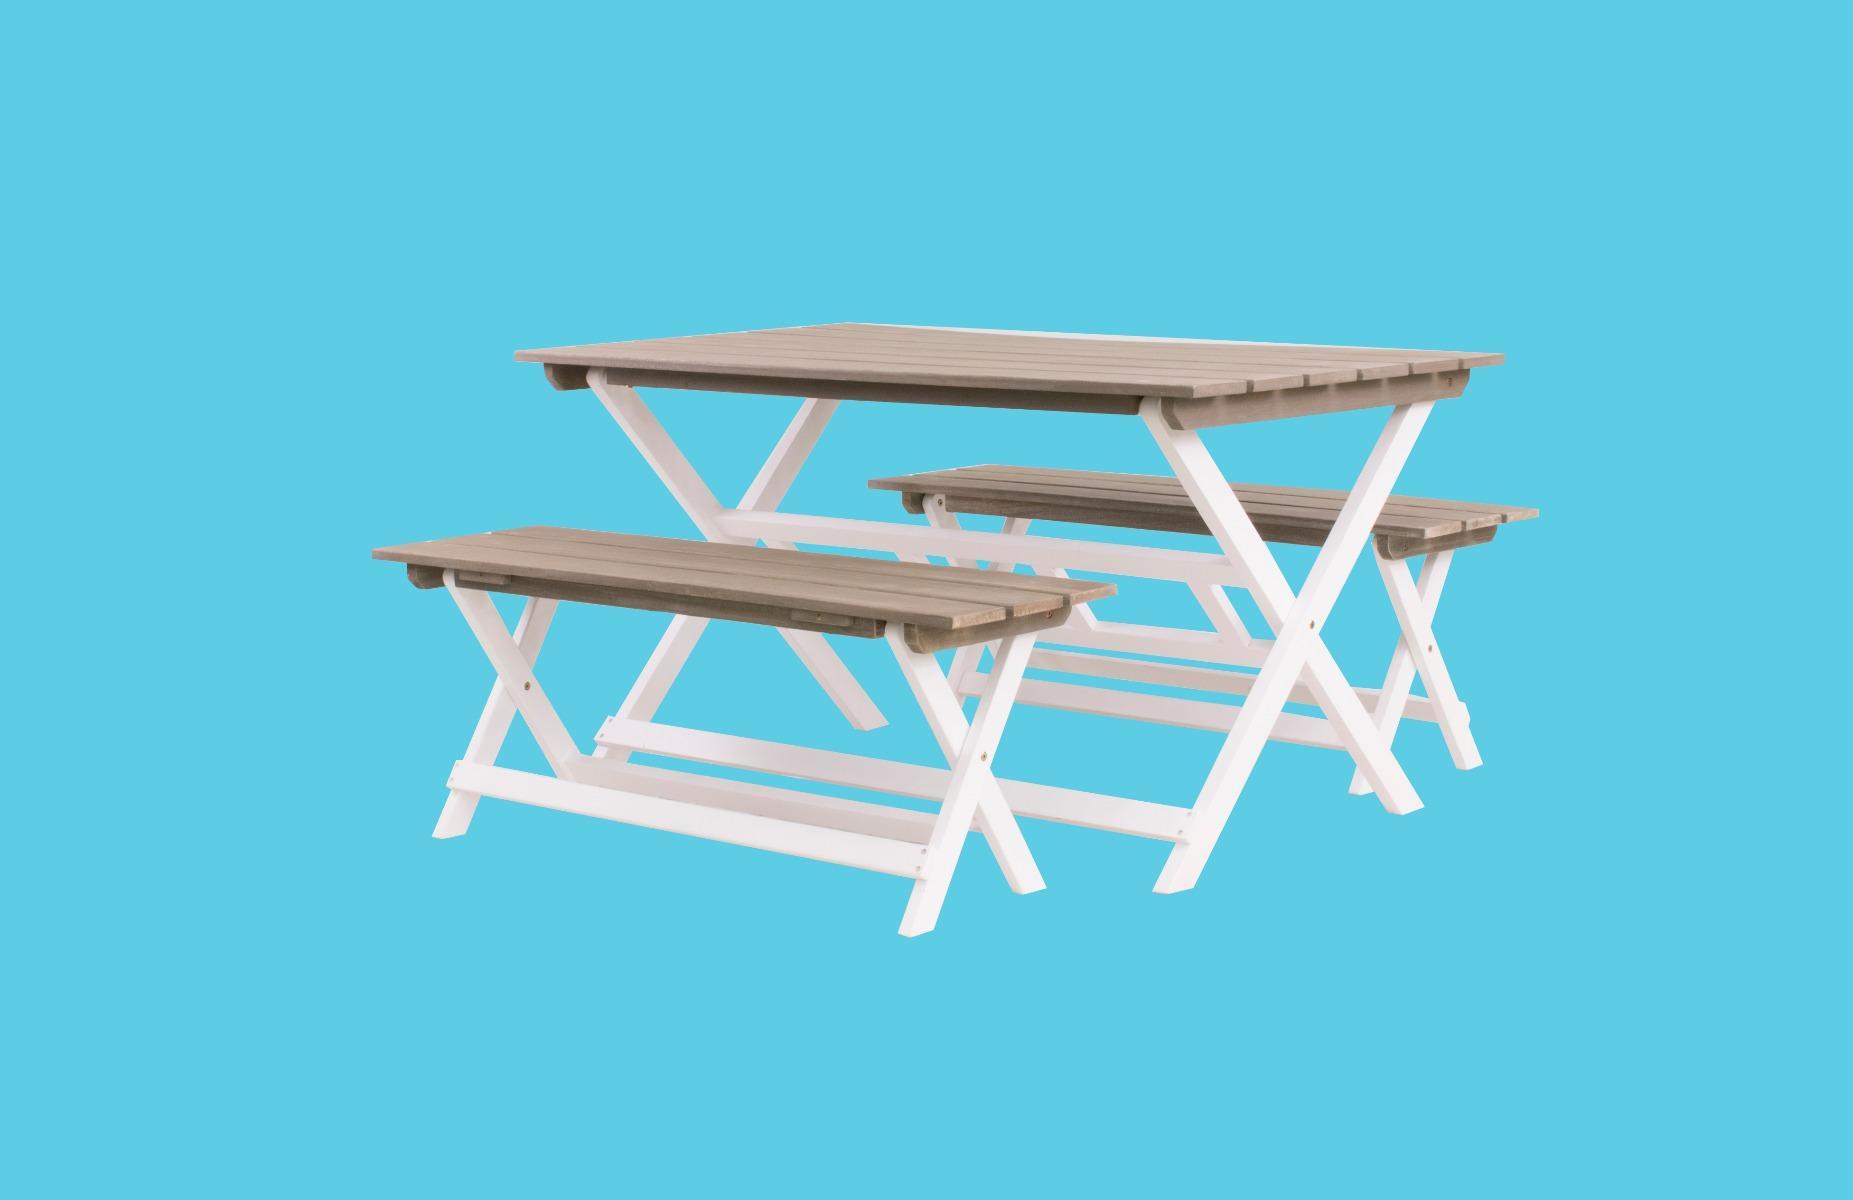 Norwich foldable set (2x bench 120x35x45 cm 1x table 140x80x74 cm)